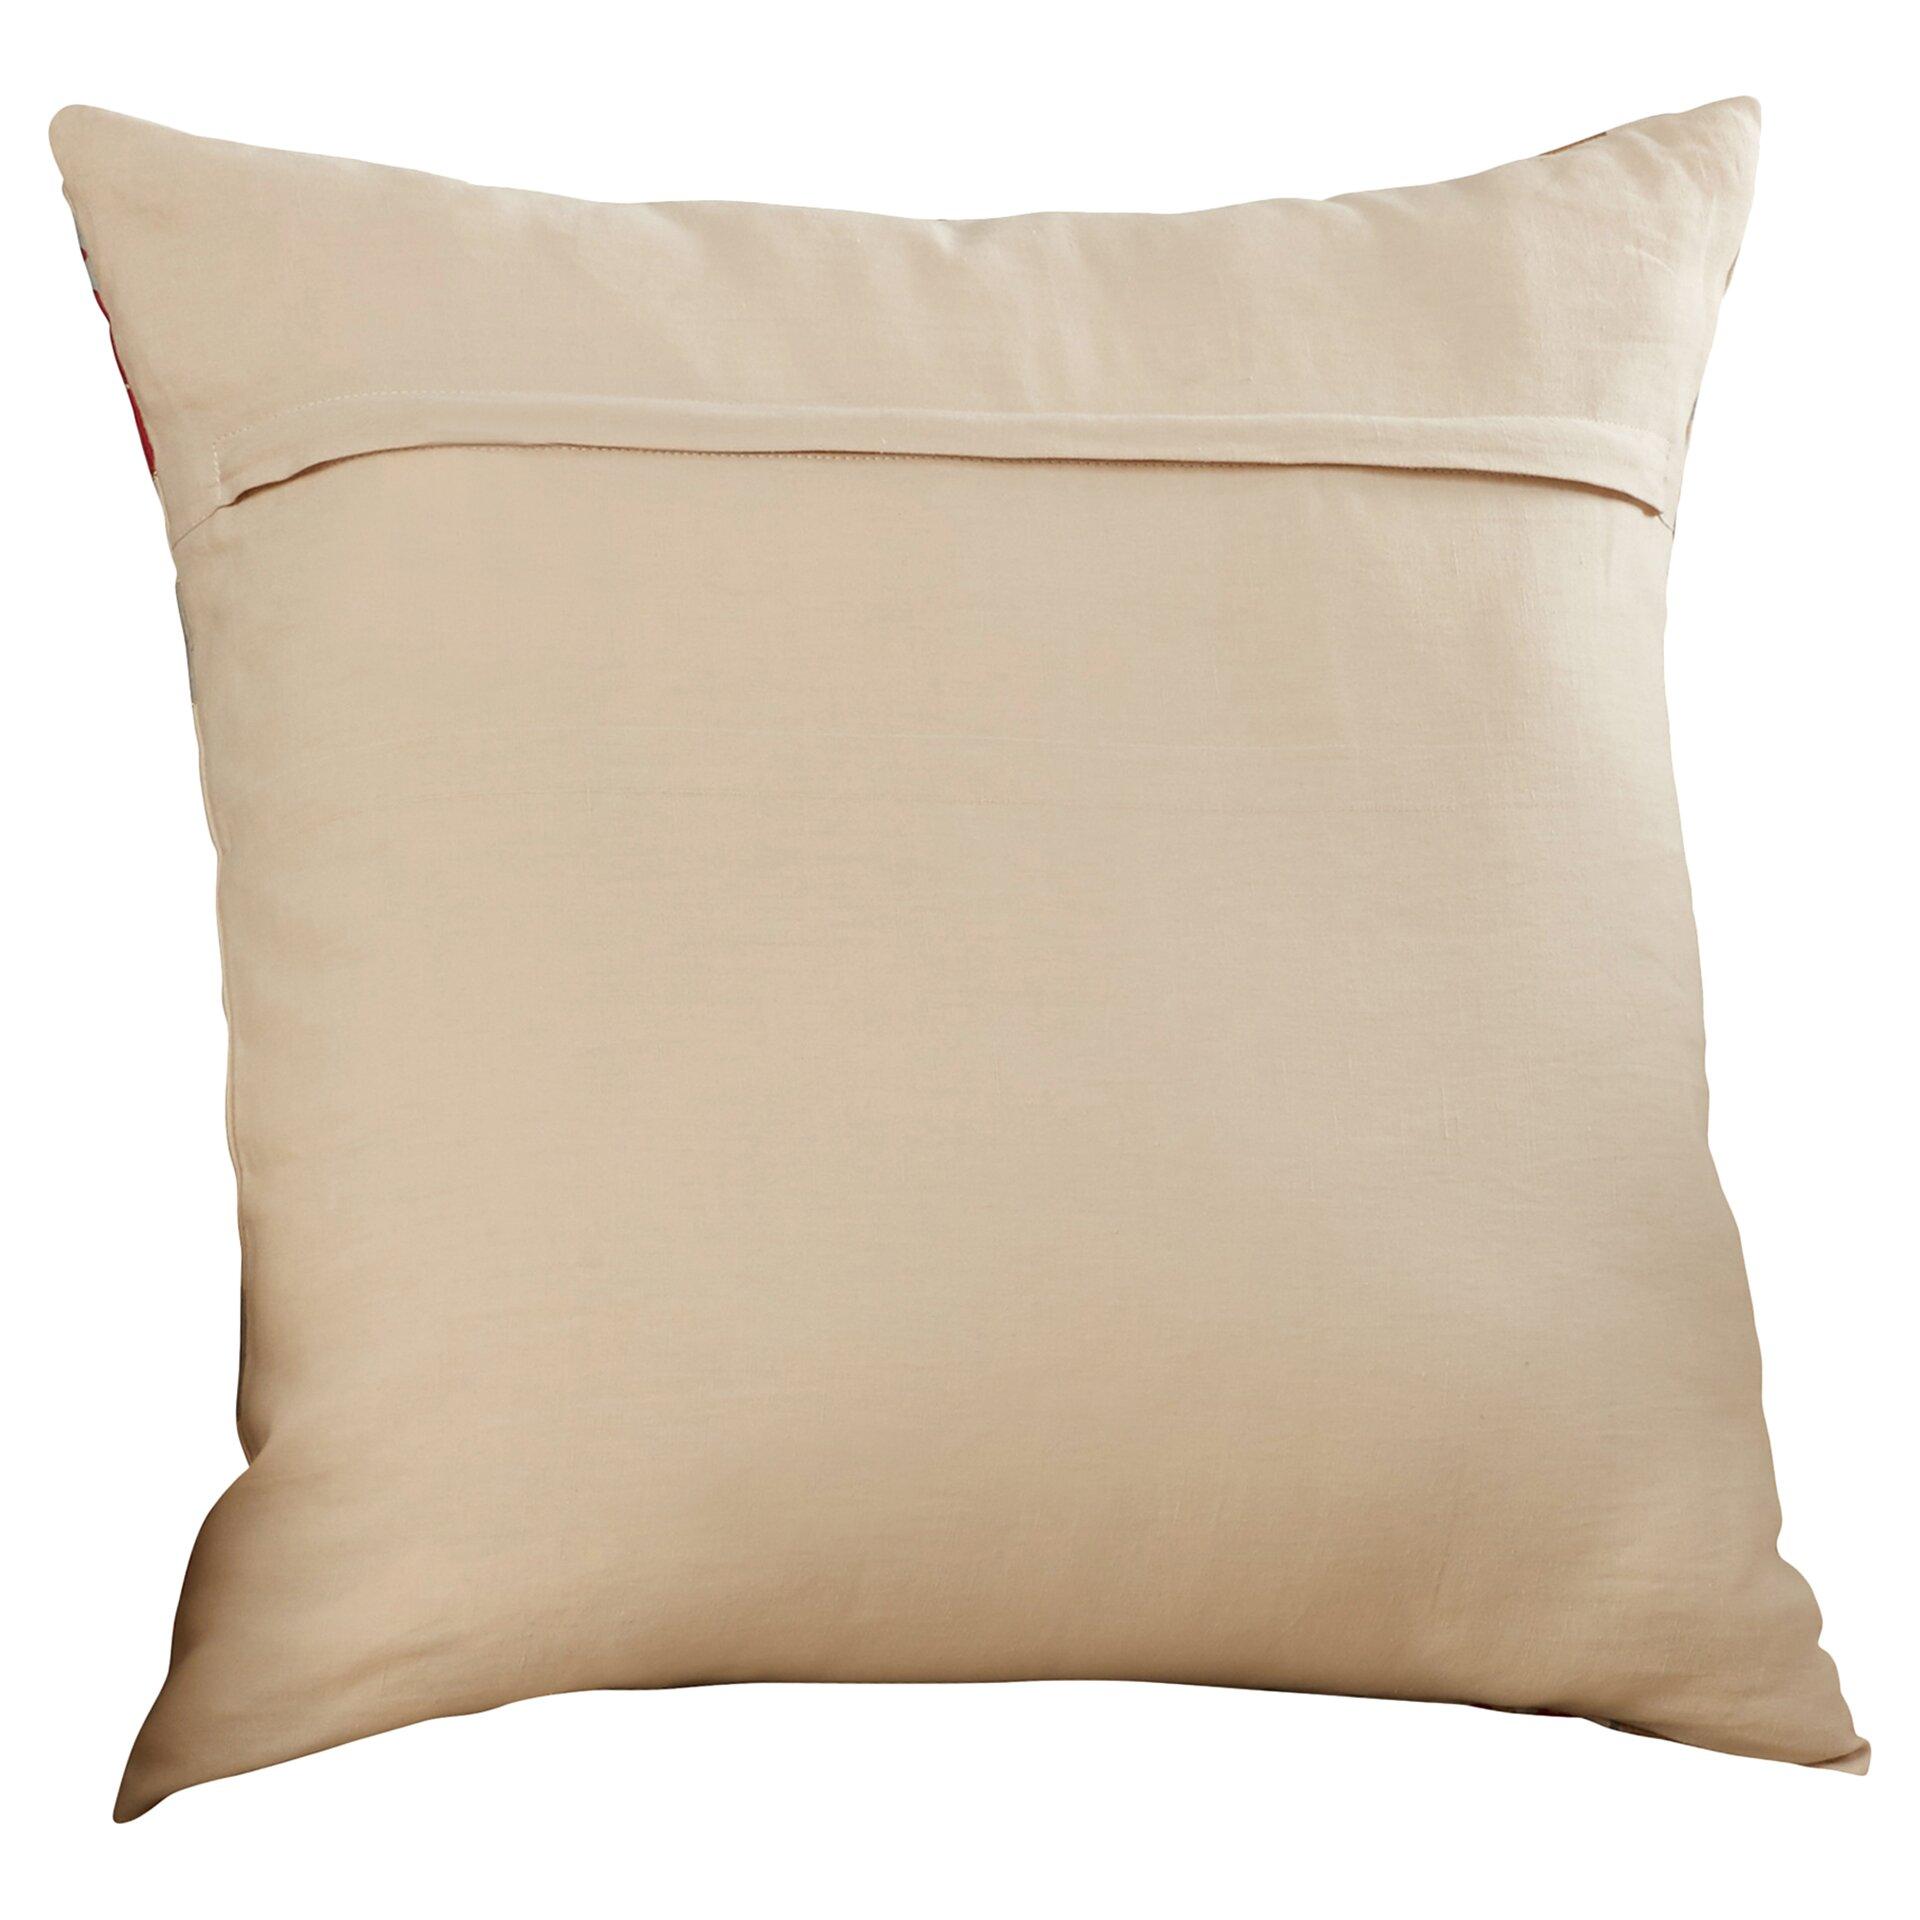 Primrose Road Throw Pillow Wayfair.ca